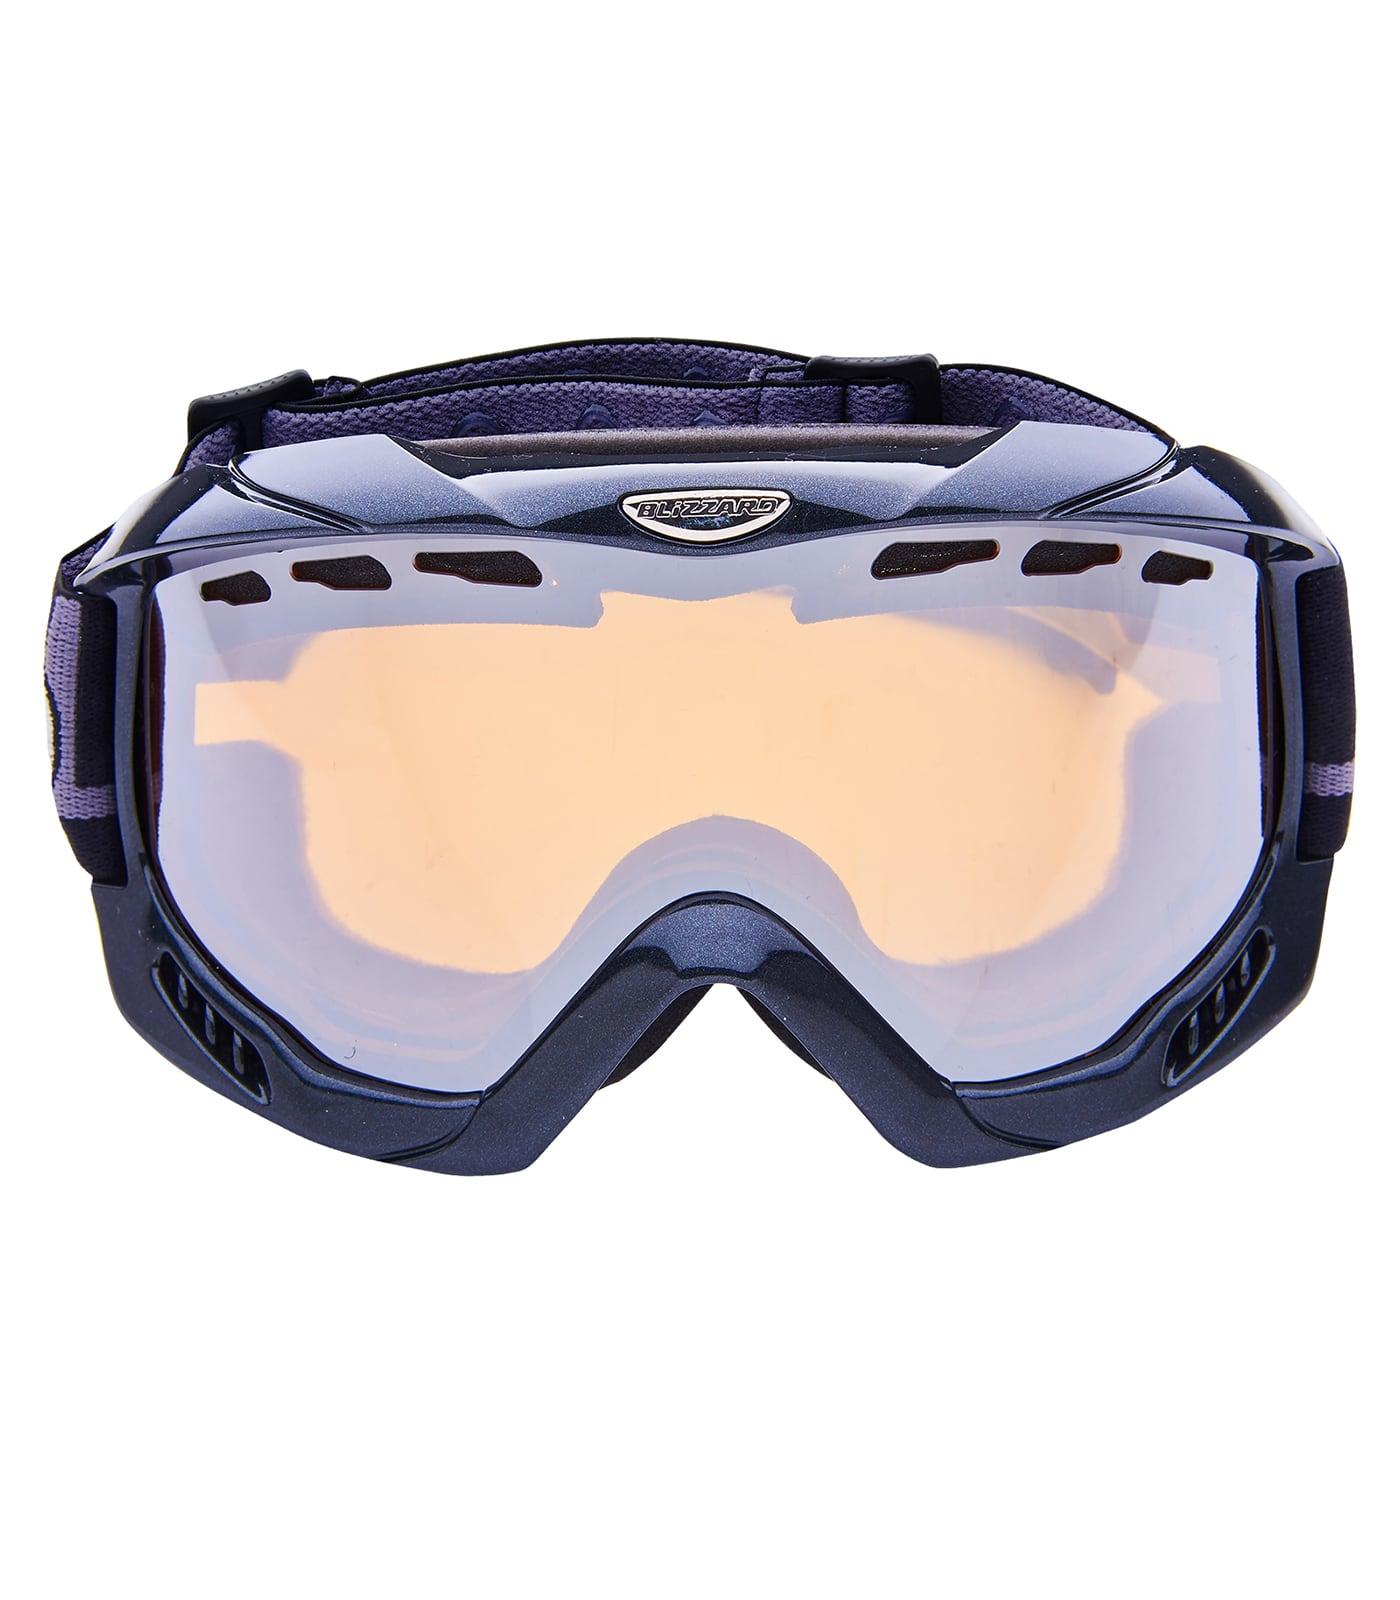 BLIZ Ski Gog. 911 MDAVZFO, black metallic, amber2-3, silver mirror